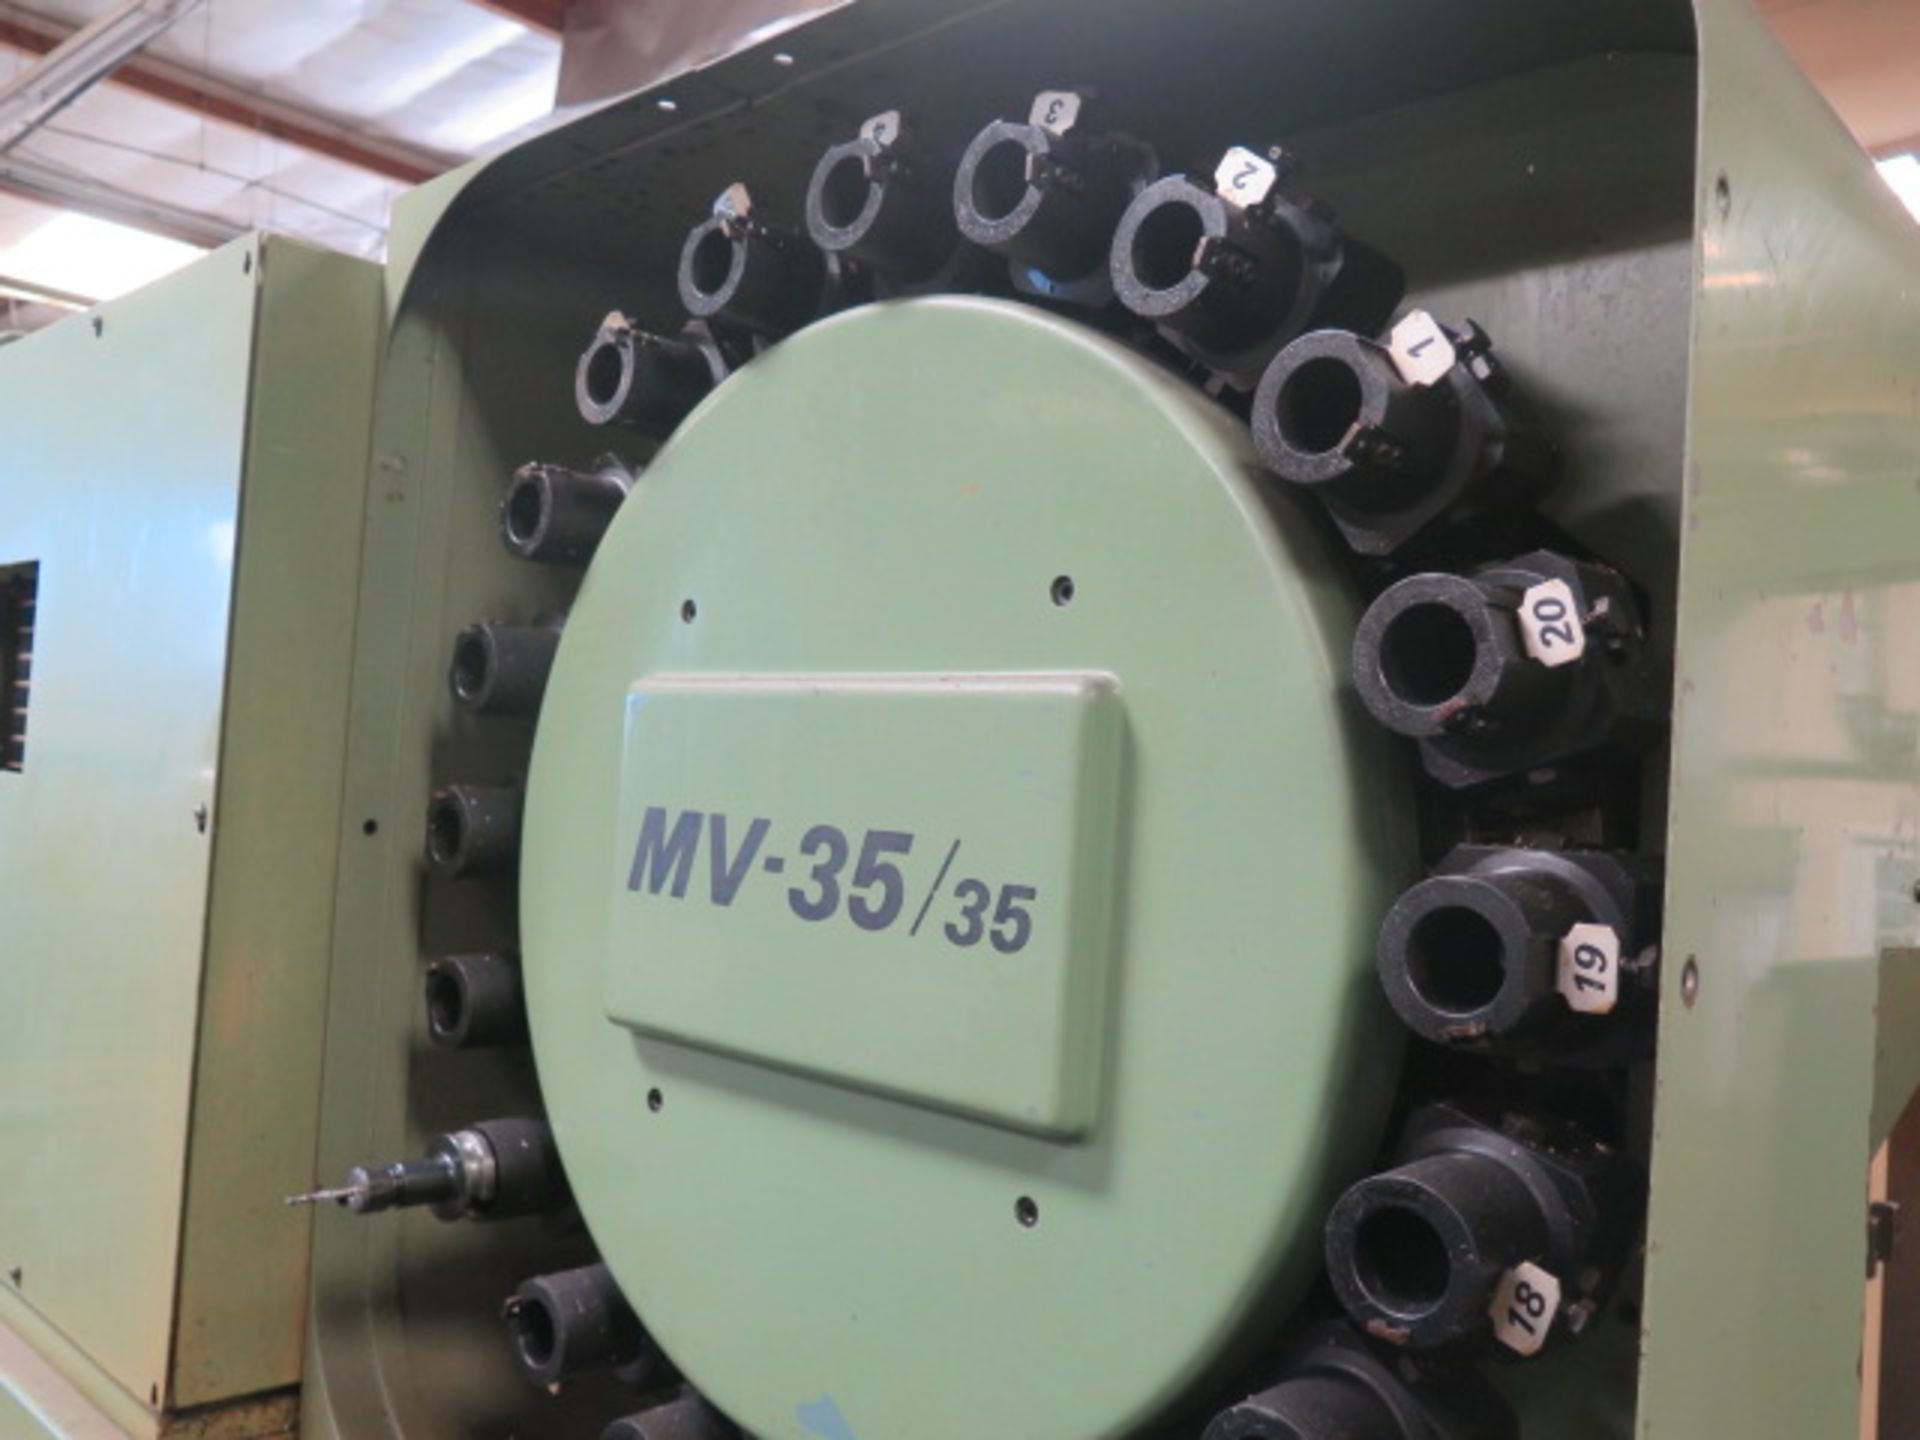 Mori Seiki MV-35/35 CNC VMC s/n 148 w/ Fanuc Controls, 20-Station ATC, BT-35, SOLD AS IS - Image 7 of 14